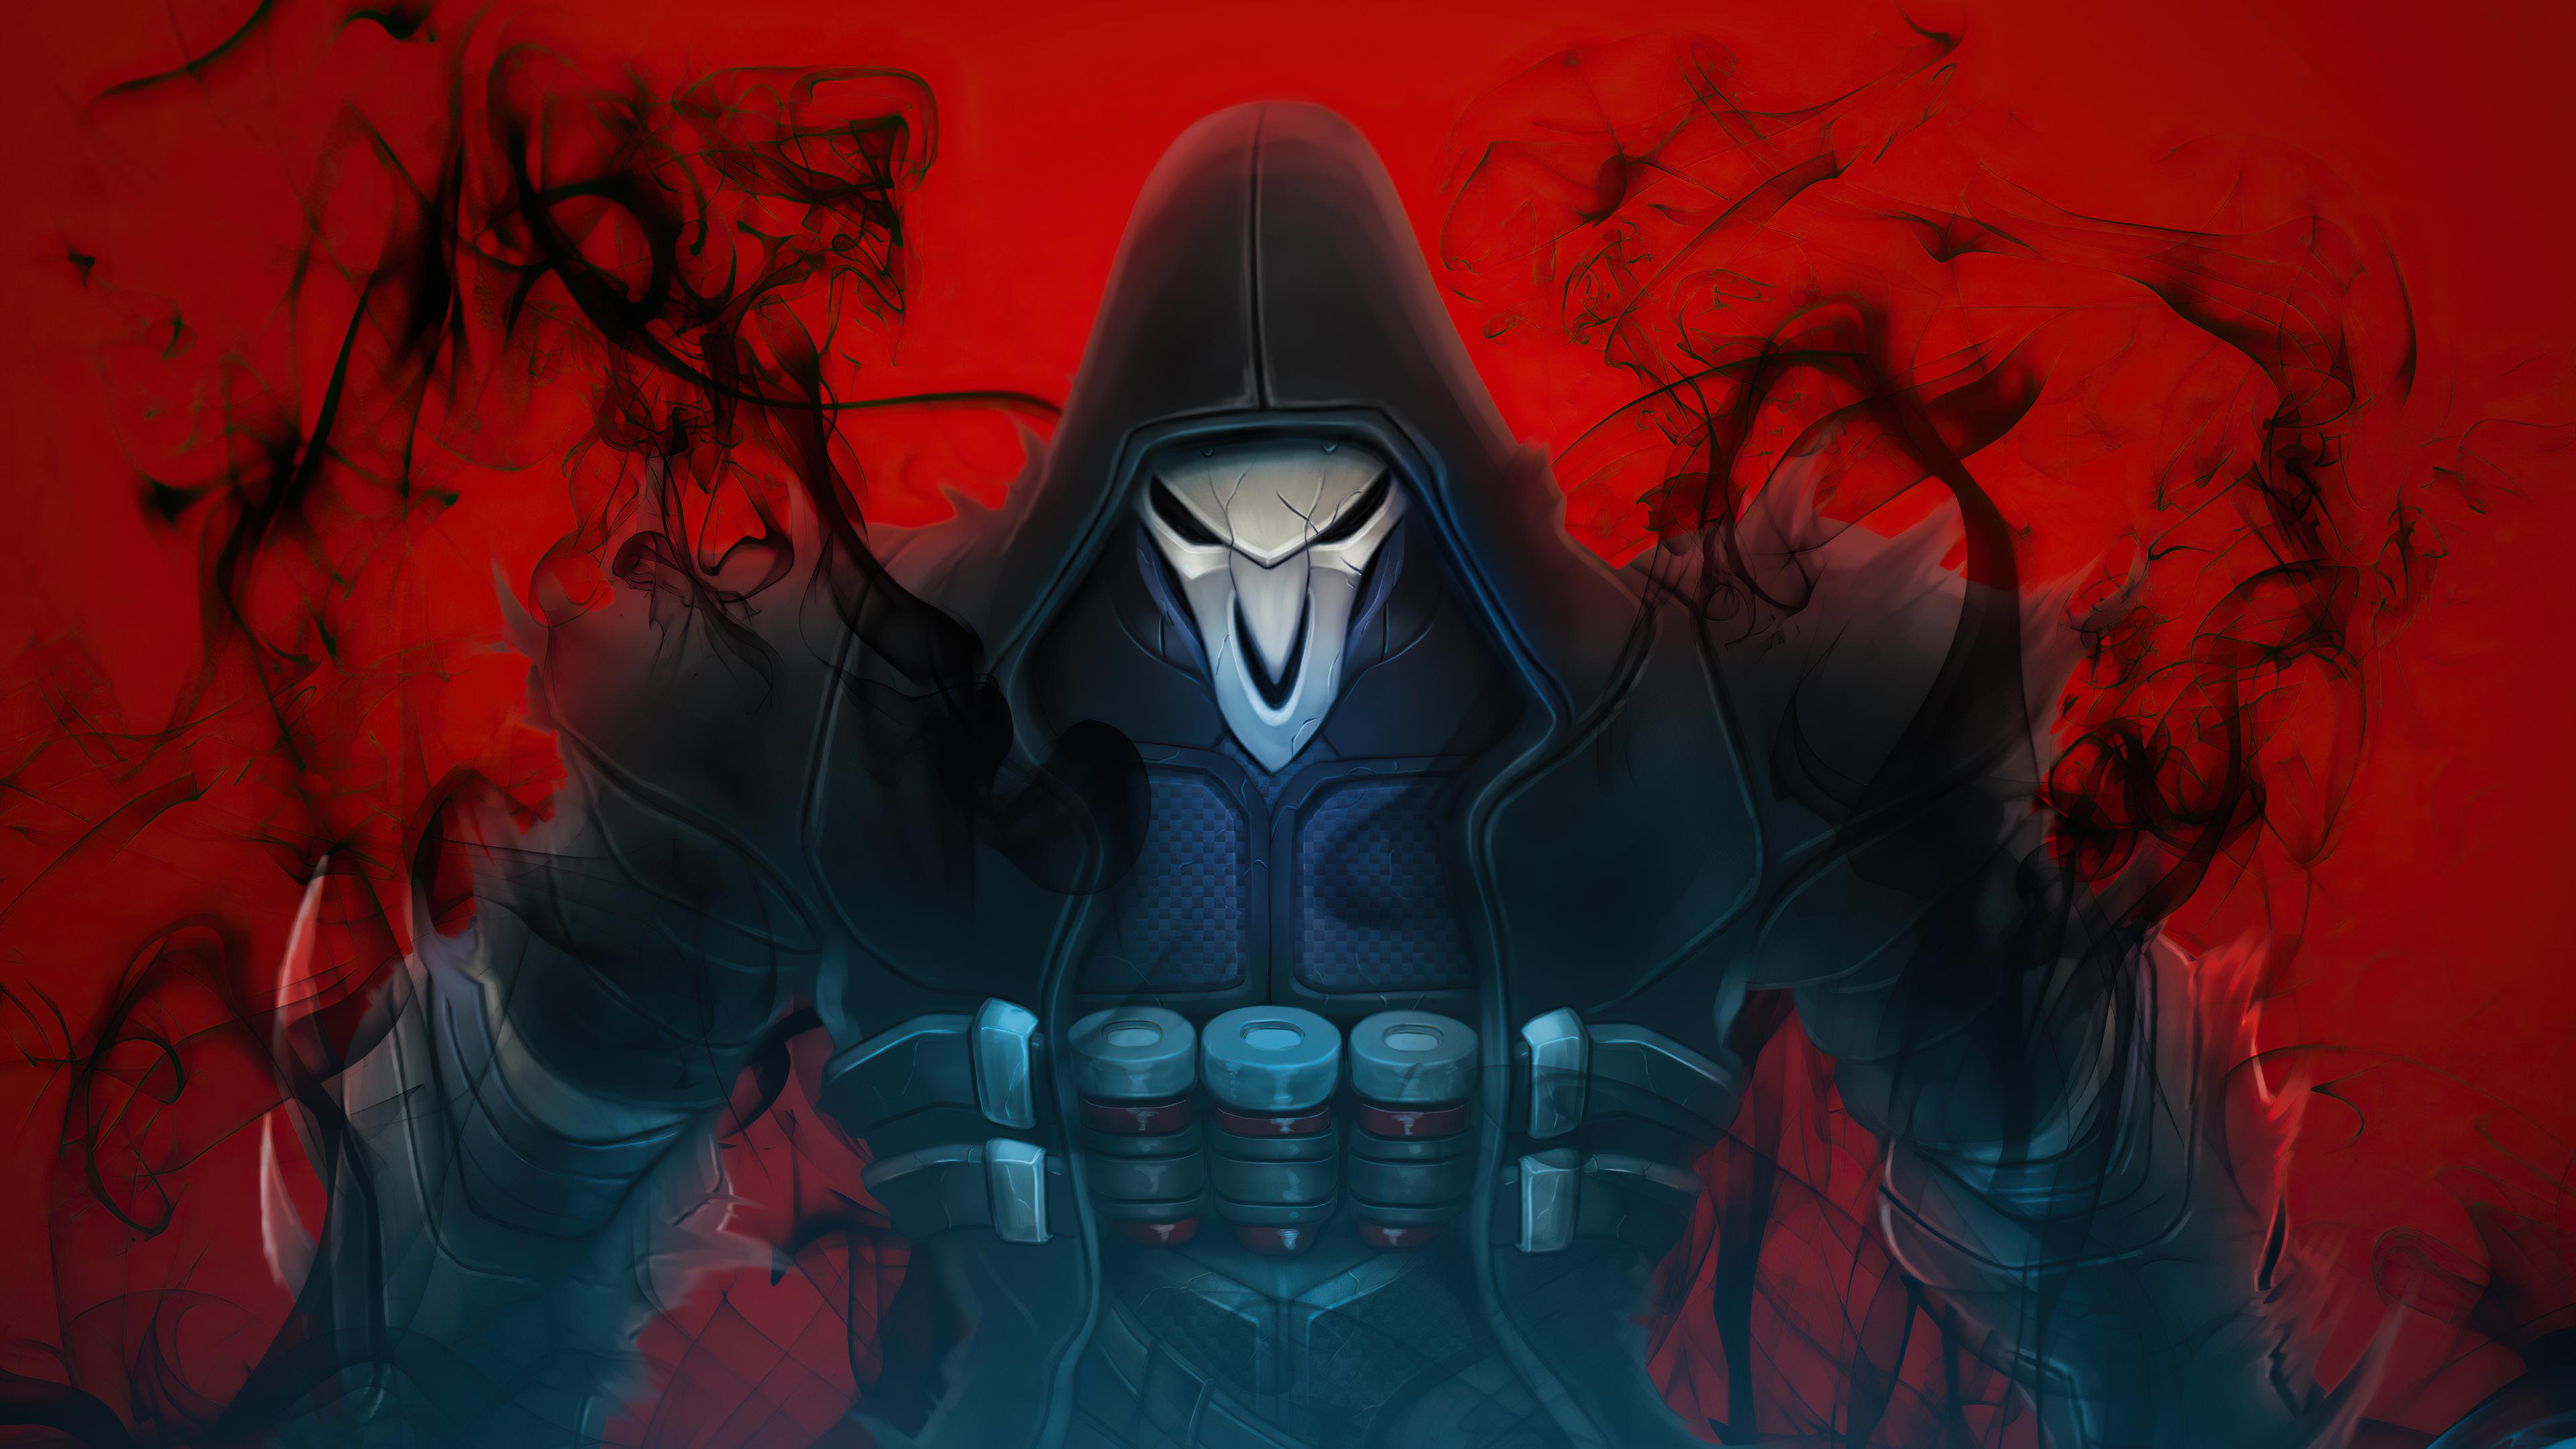 reaper overwatch fanart 4k 1618136612 - Reaper Overwatch Fanart 4k - Reaper Overwatch Fanart 4k wallpapers